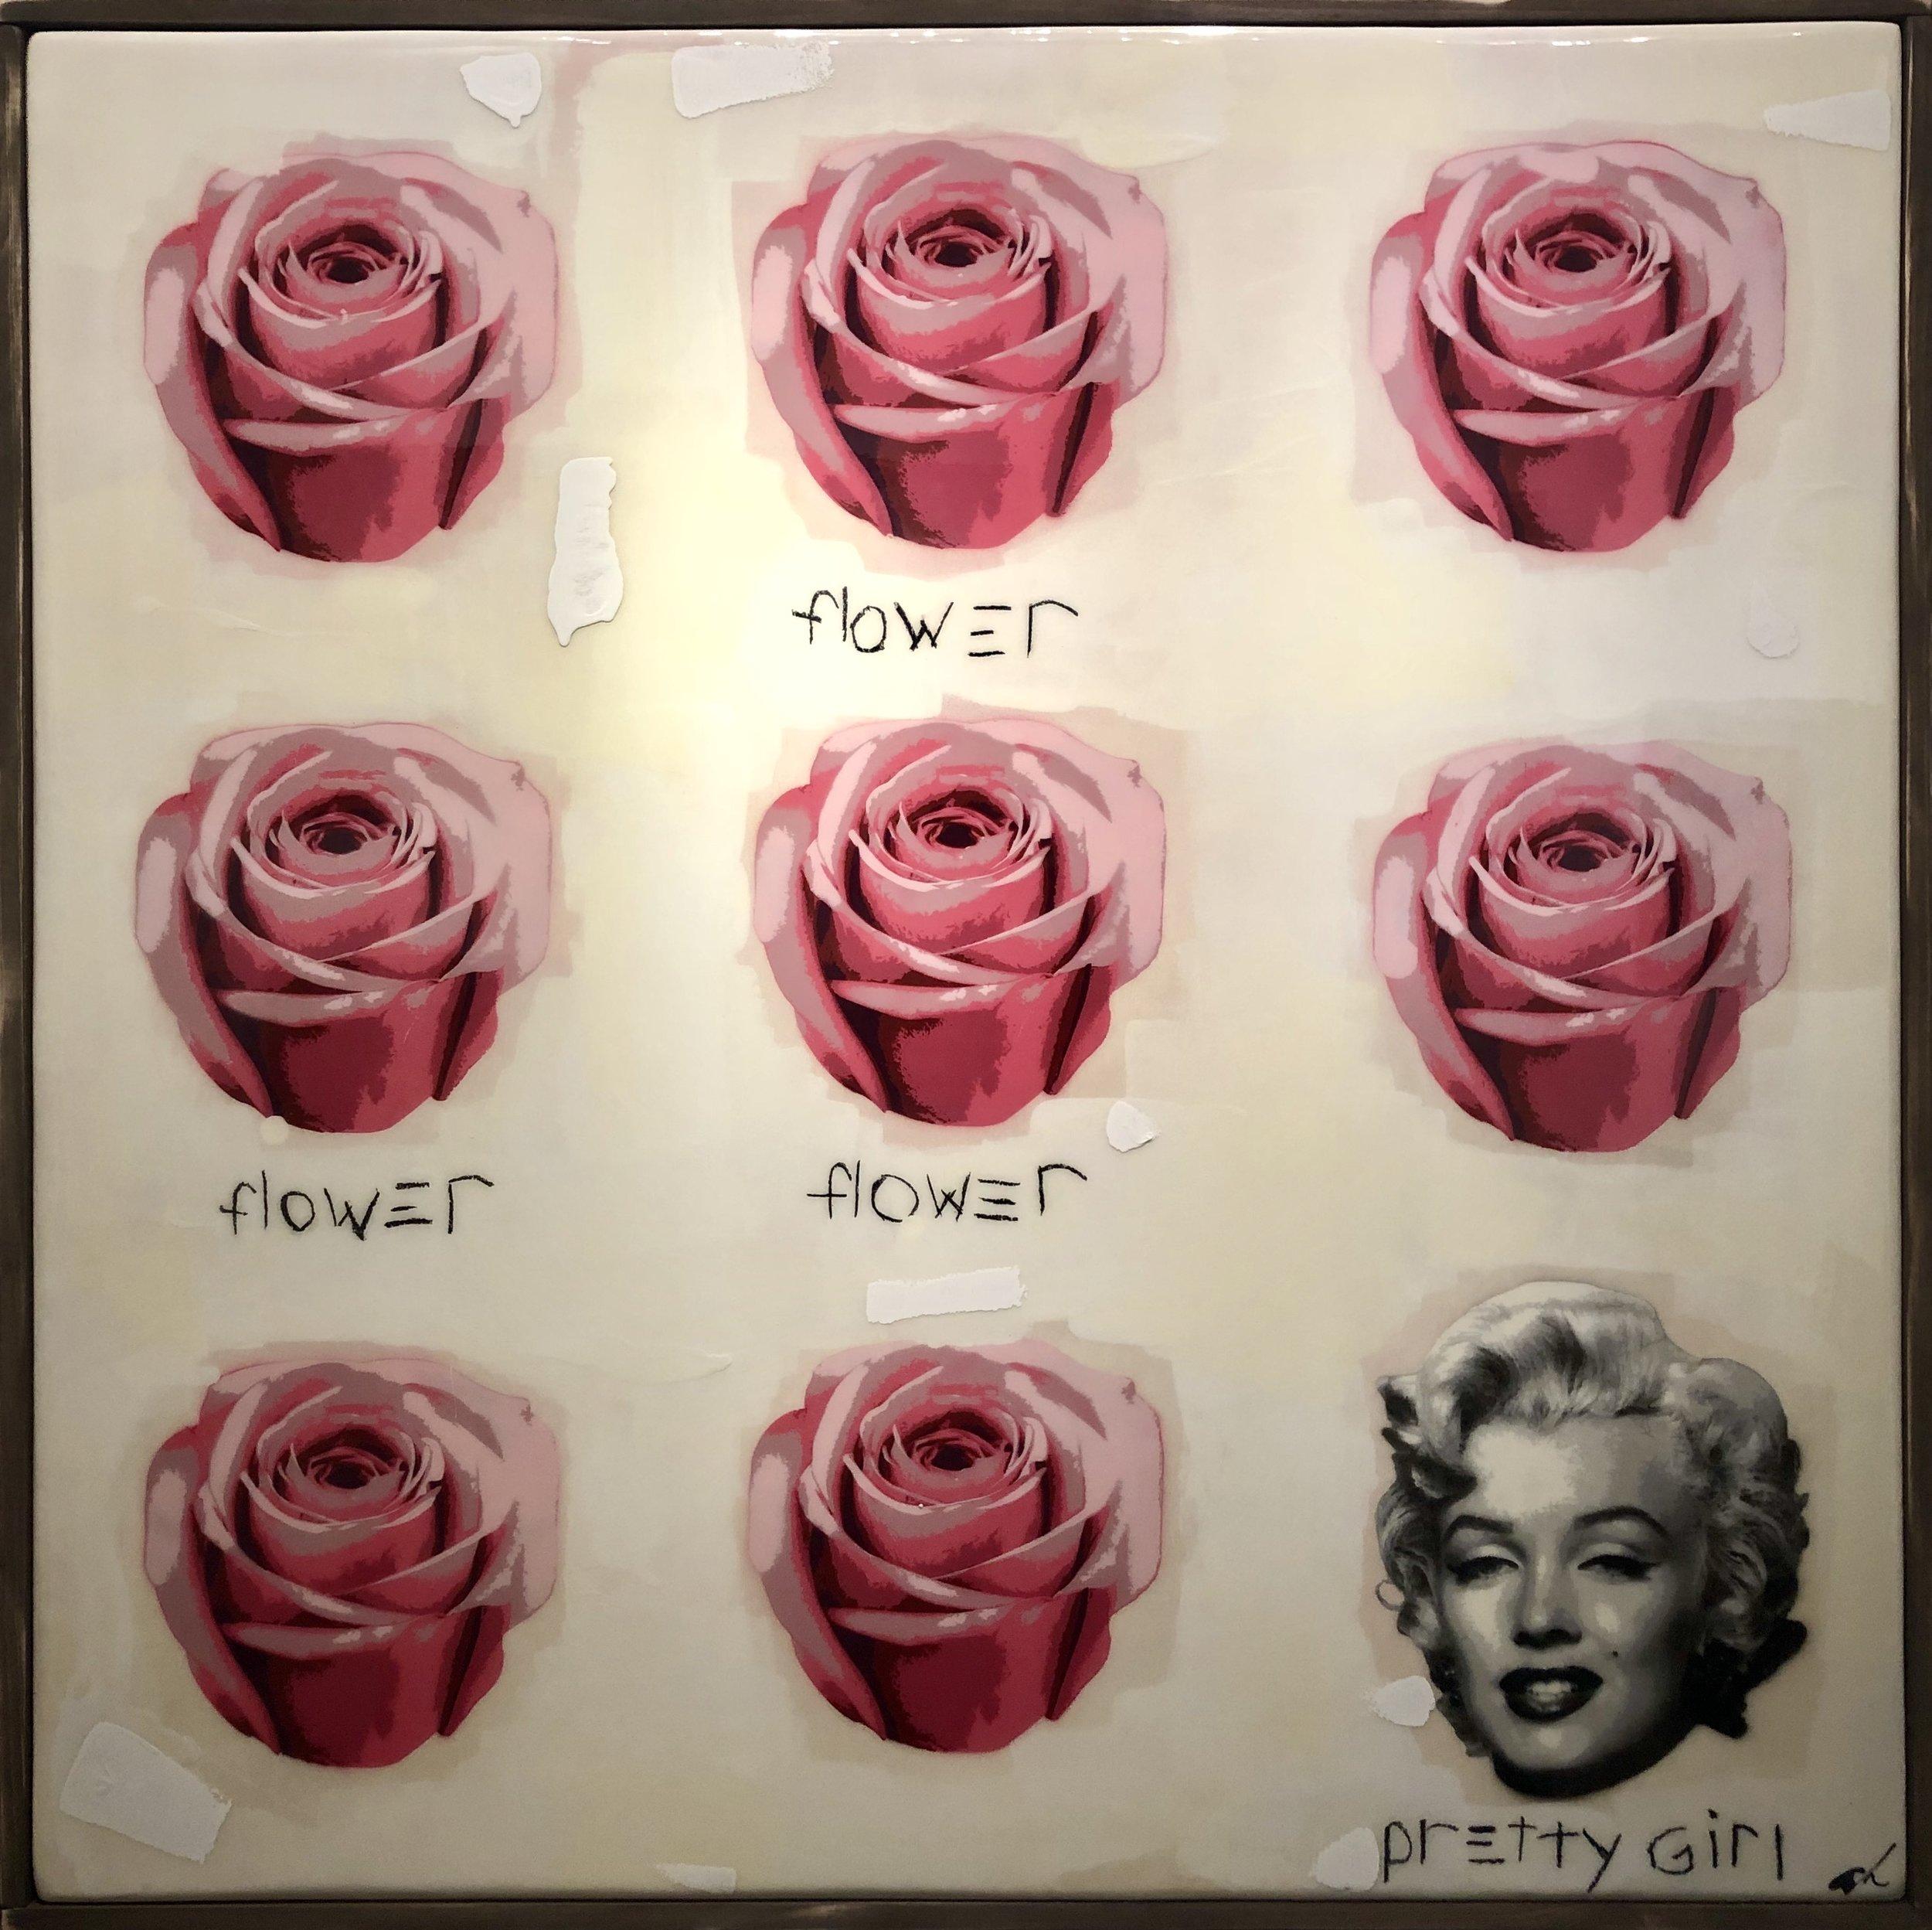 Flower, Flower, Pretty Girl 50x50